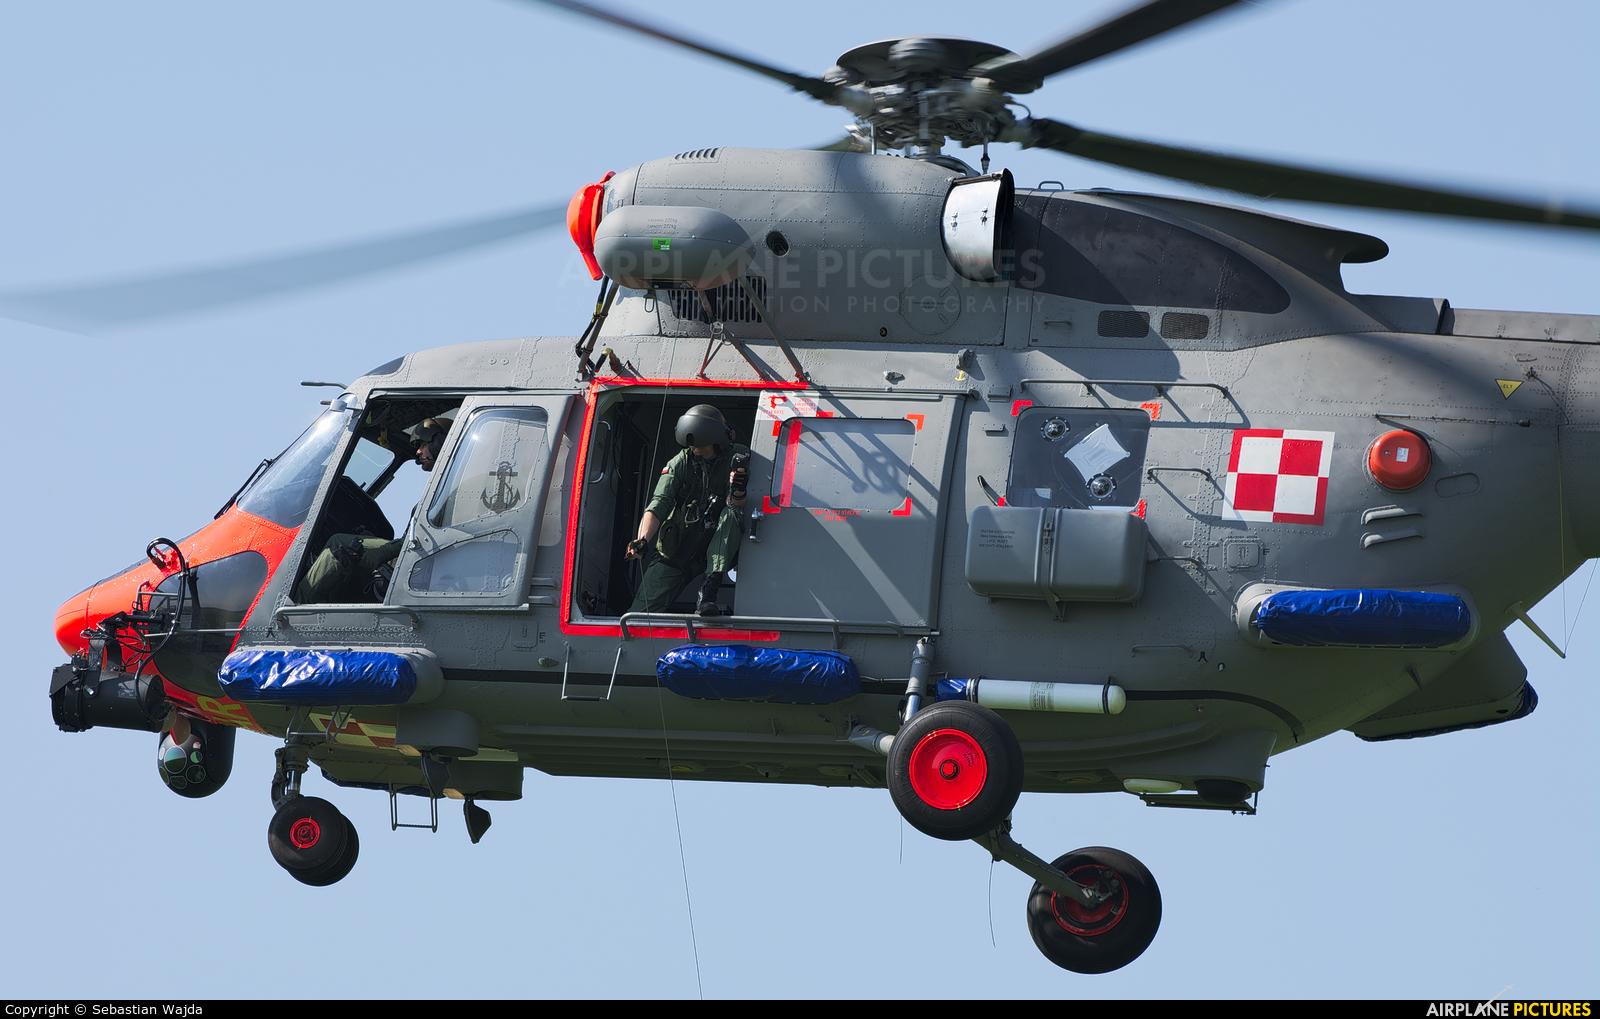 Poland - Navy 0815 aircraft at Pruszcz Gdański